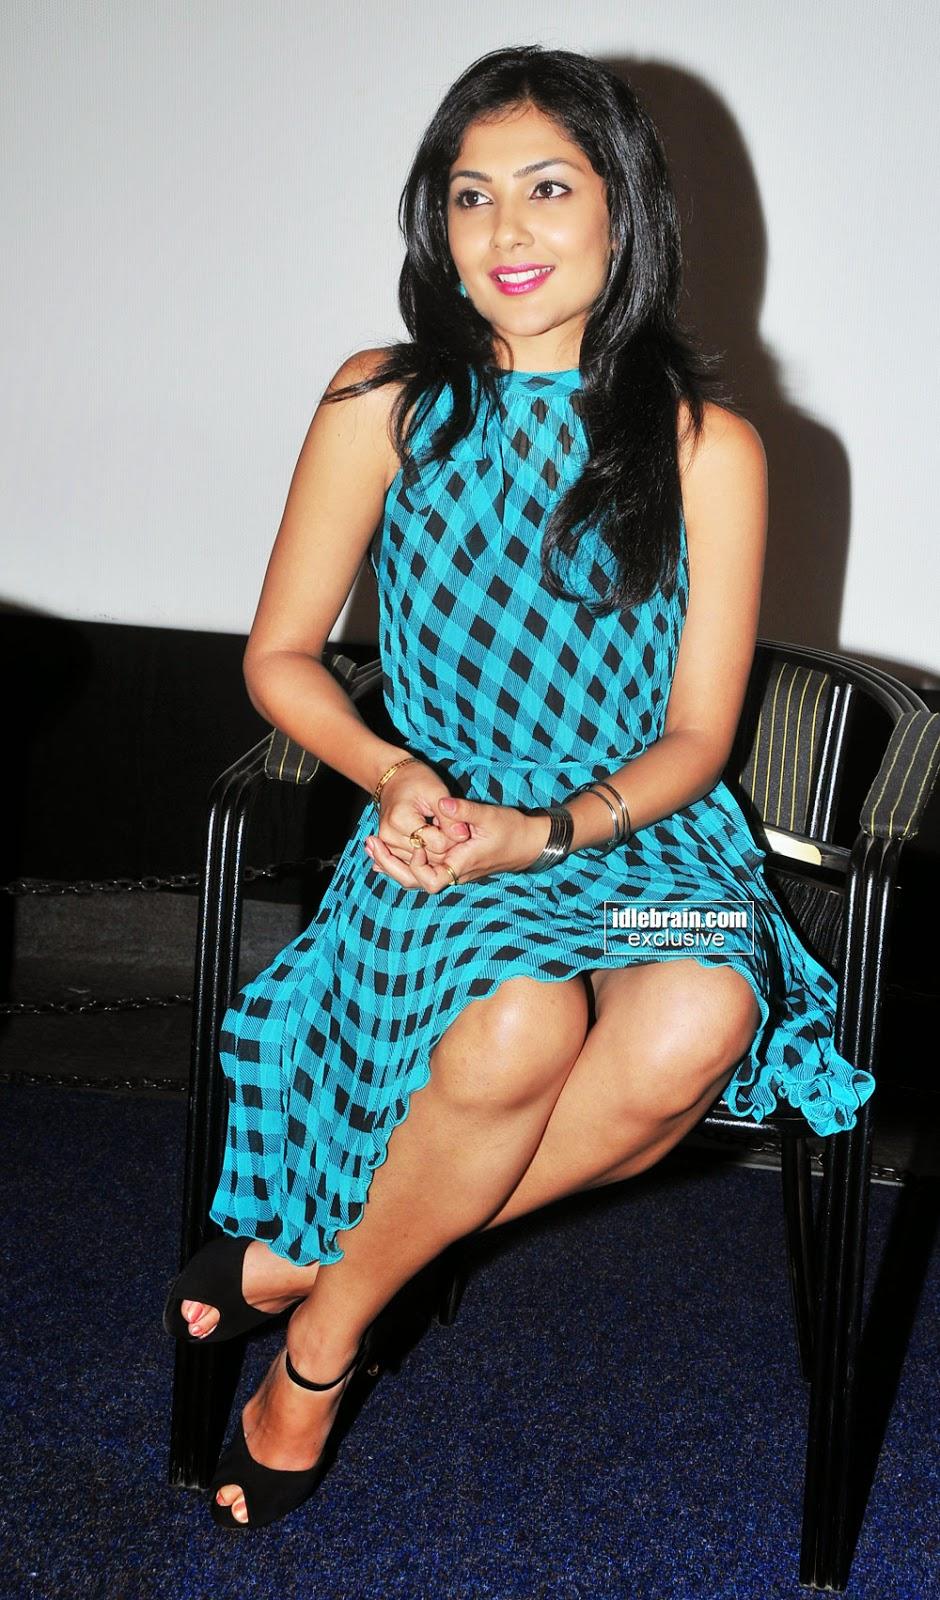 Kamalinee Mukherjee naked (26 photos) Boobs, YouTube, see through